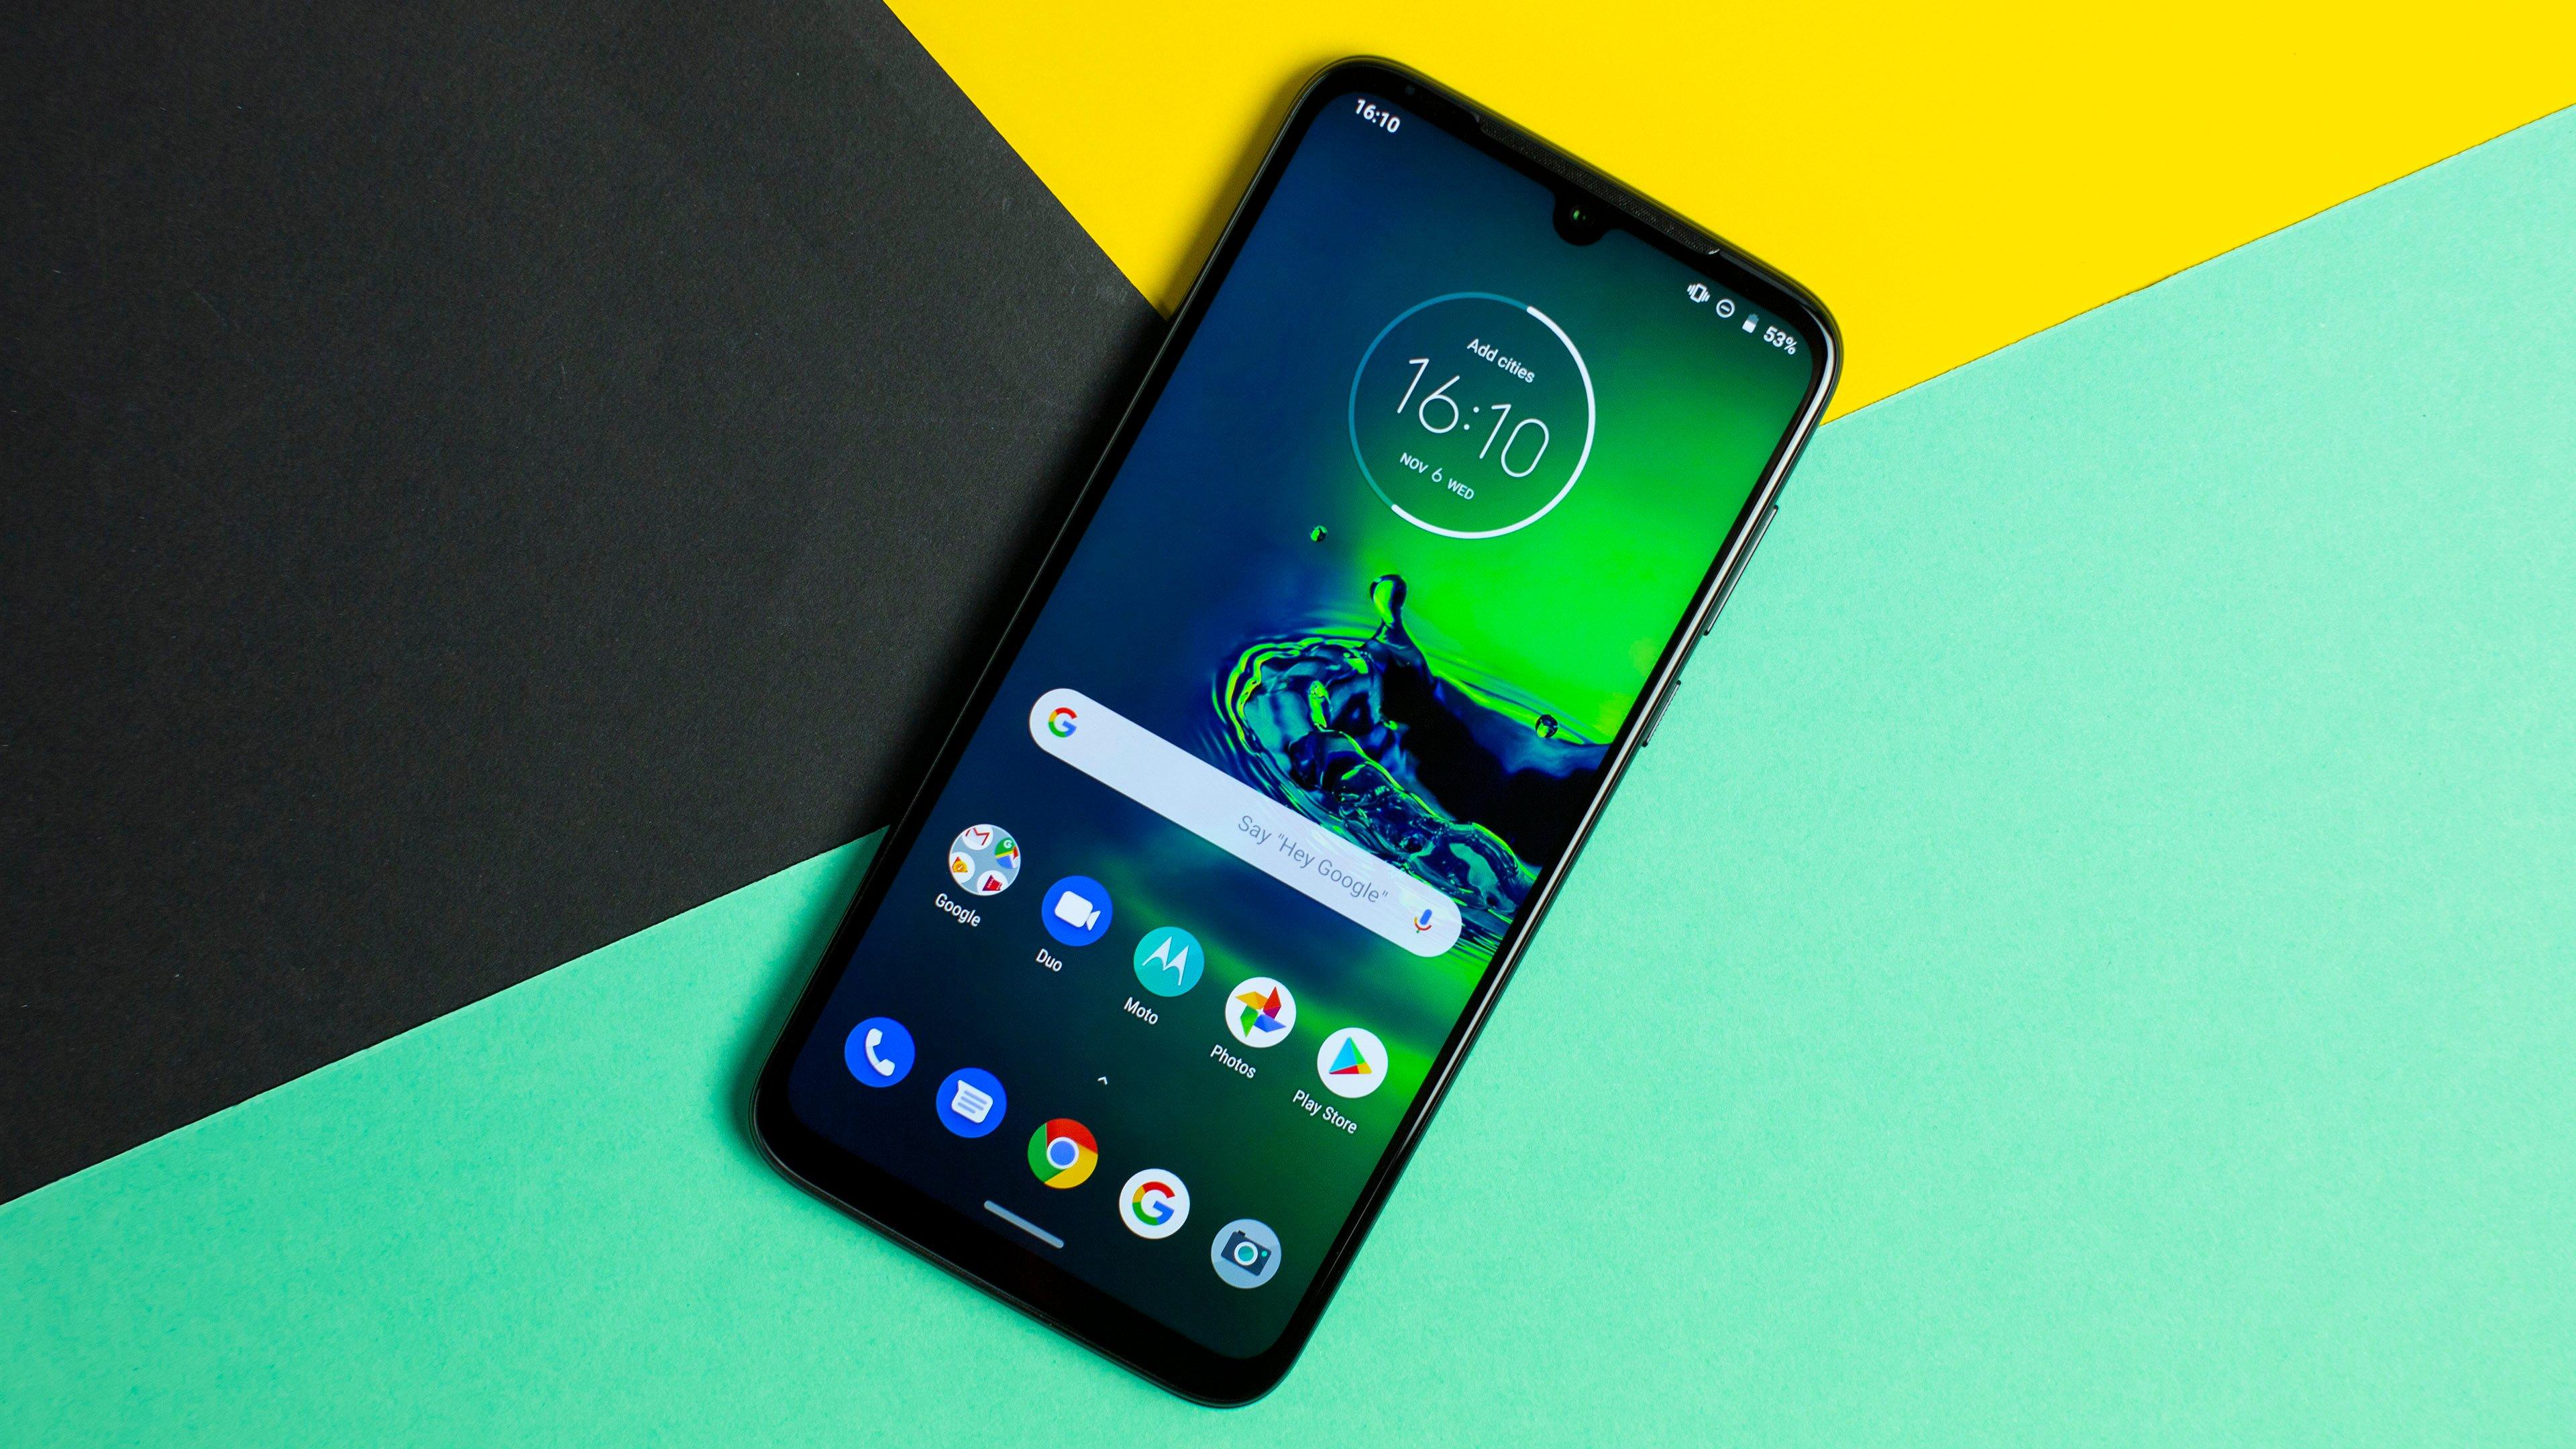 Motorola G8 Plus review: more Moto for the mid-range, Next TGP